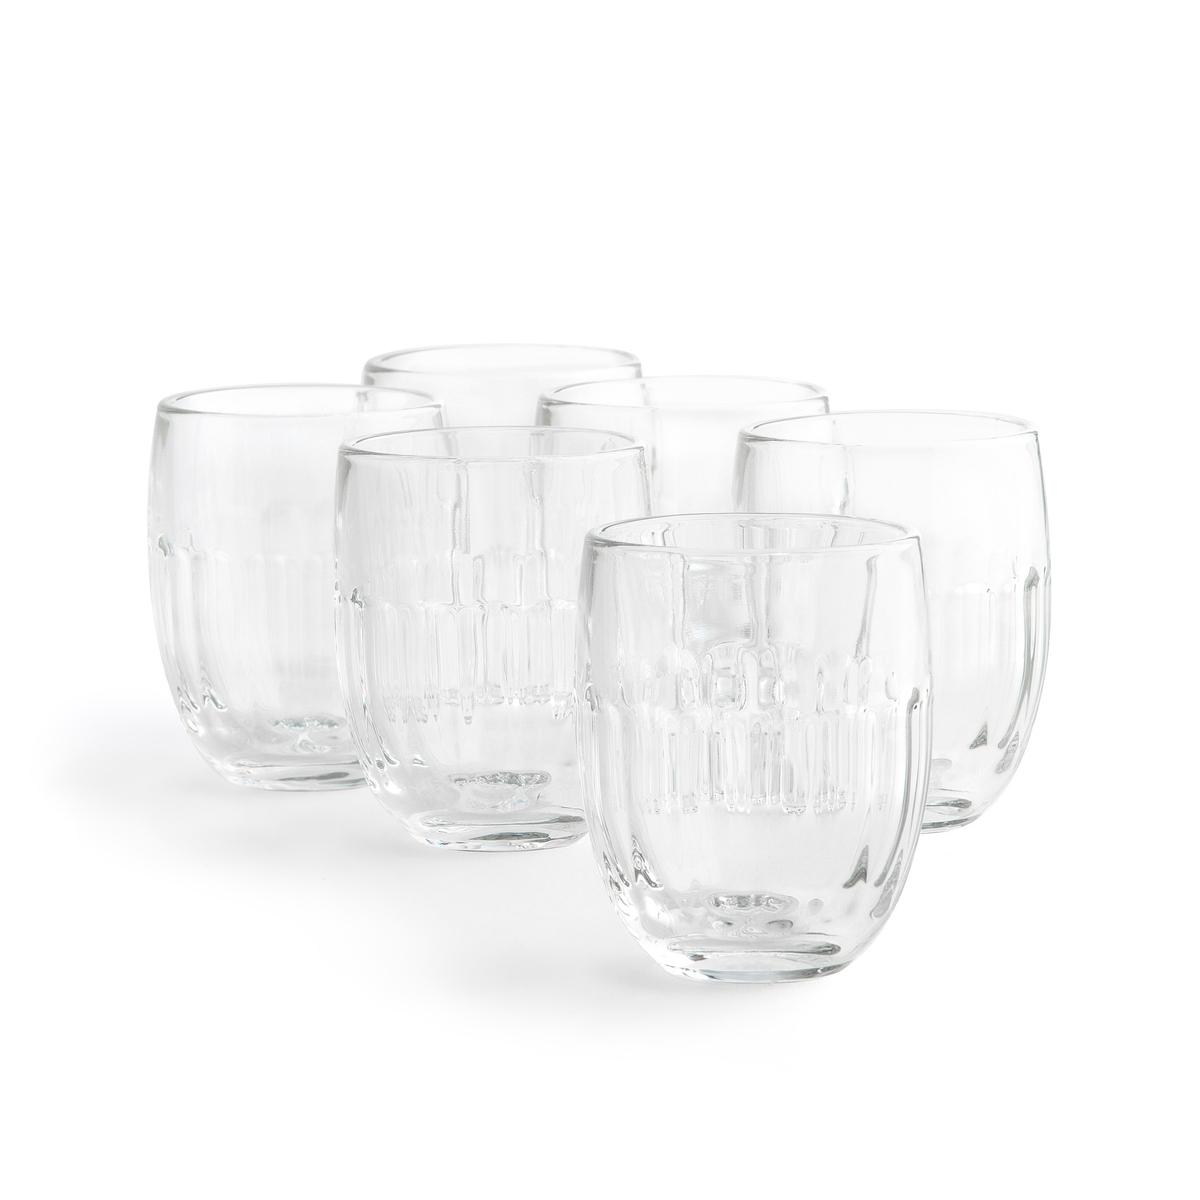 Alchyse Glasses (Set of 6)